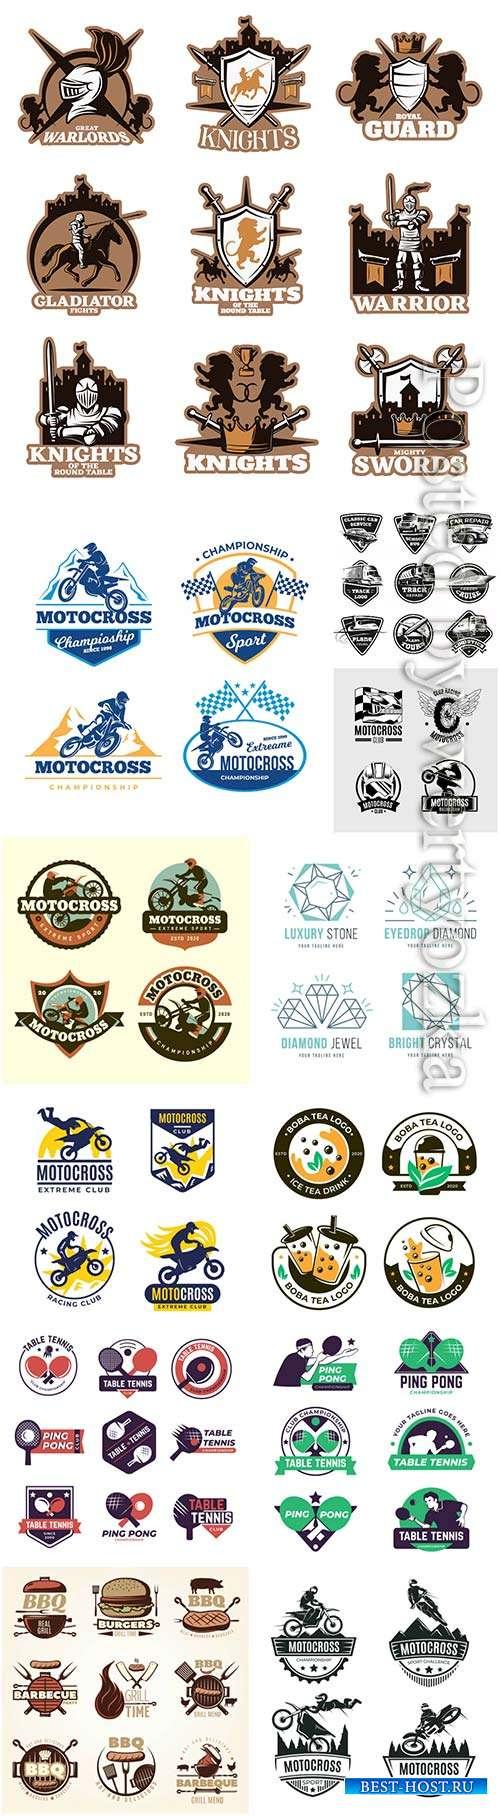 Logos in vector